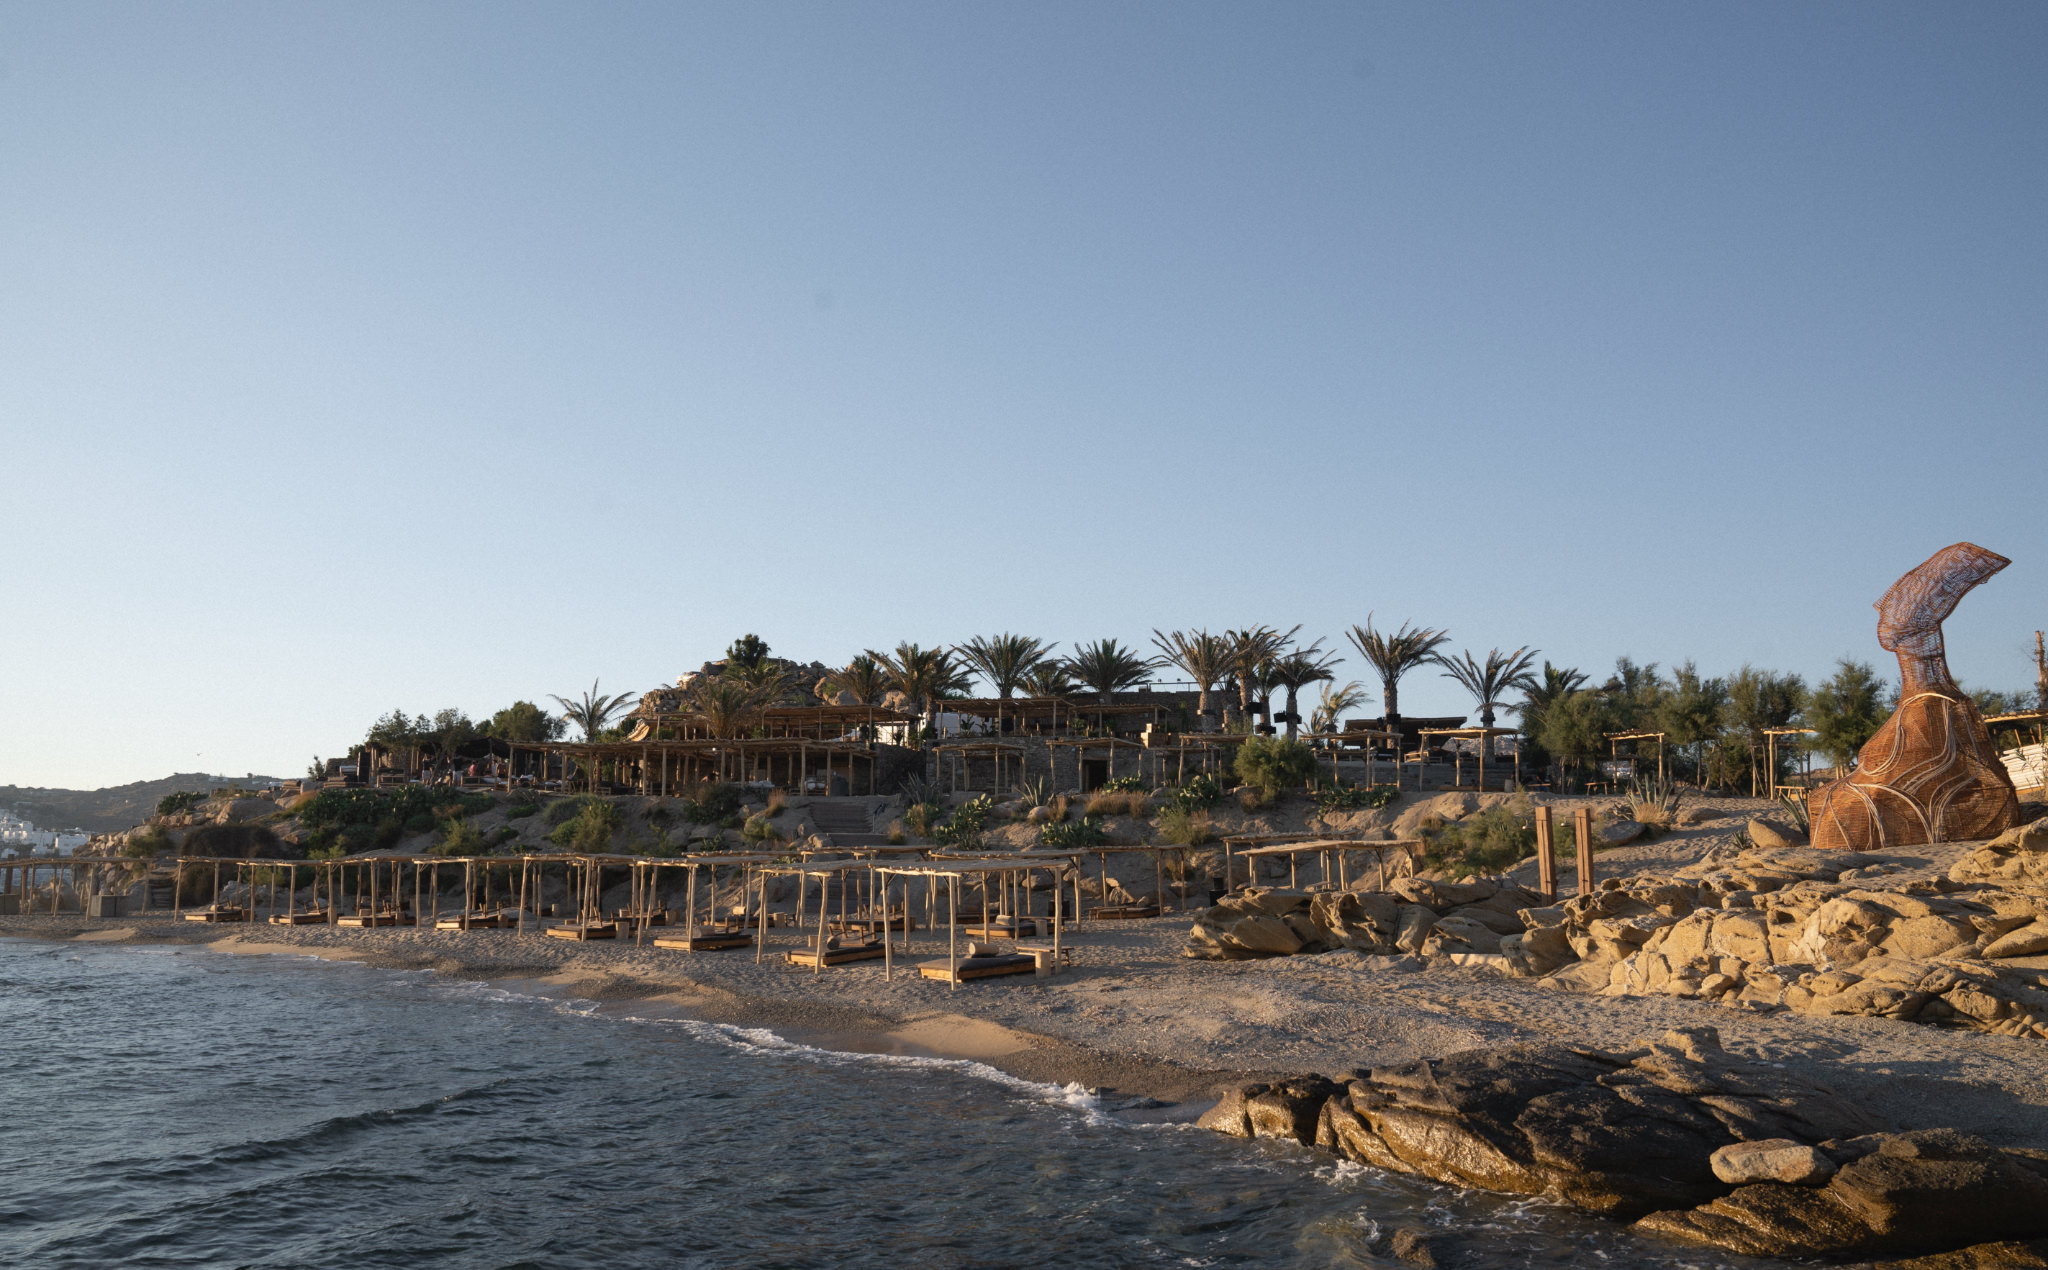 Scorpios Mykonos beach bar and restaurant in Greece